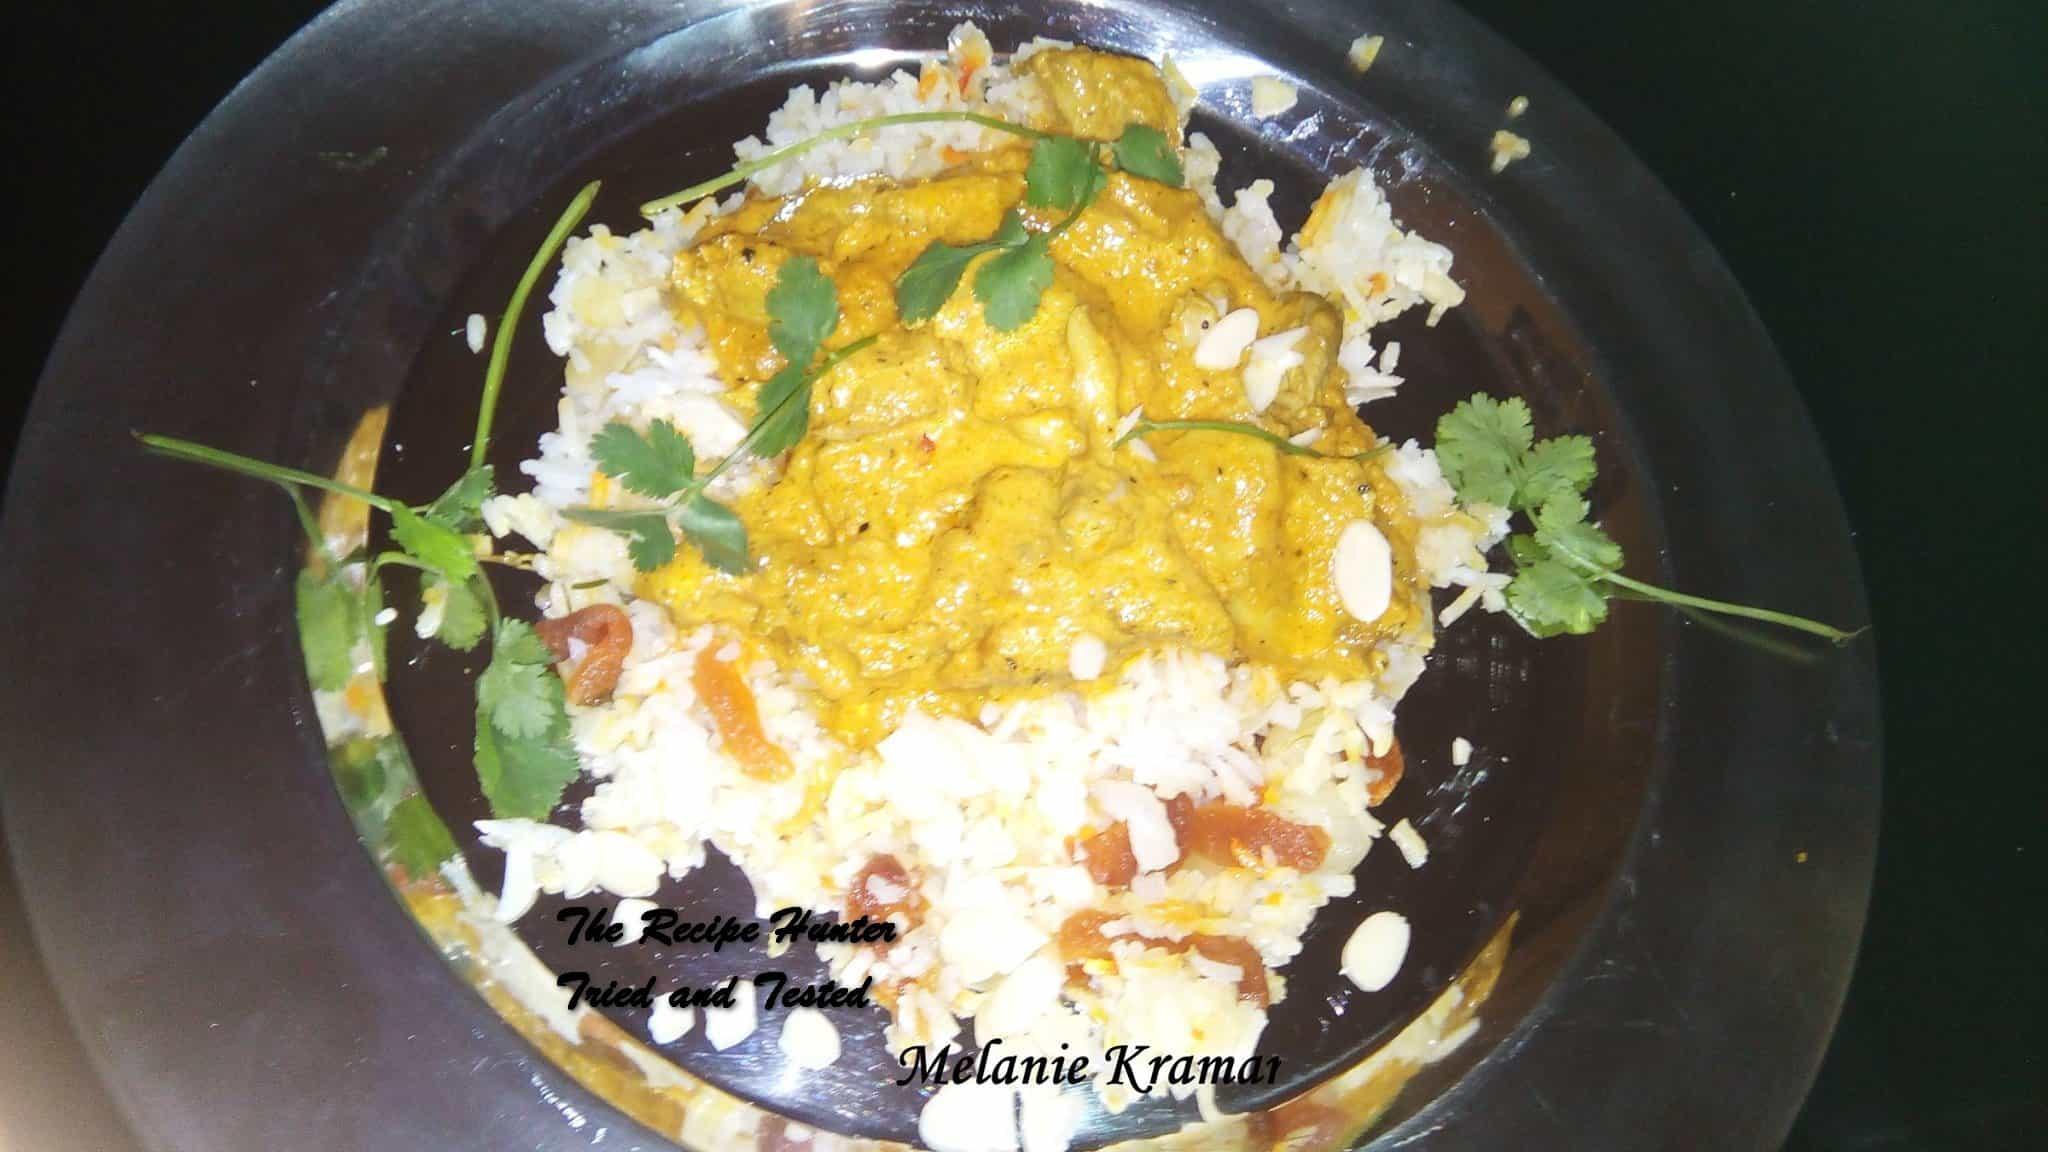 trh-melanies-taj-maholla-chicken-in-butter-sauce-bollywood-basmati-rice